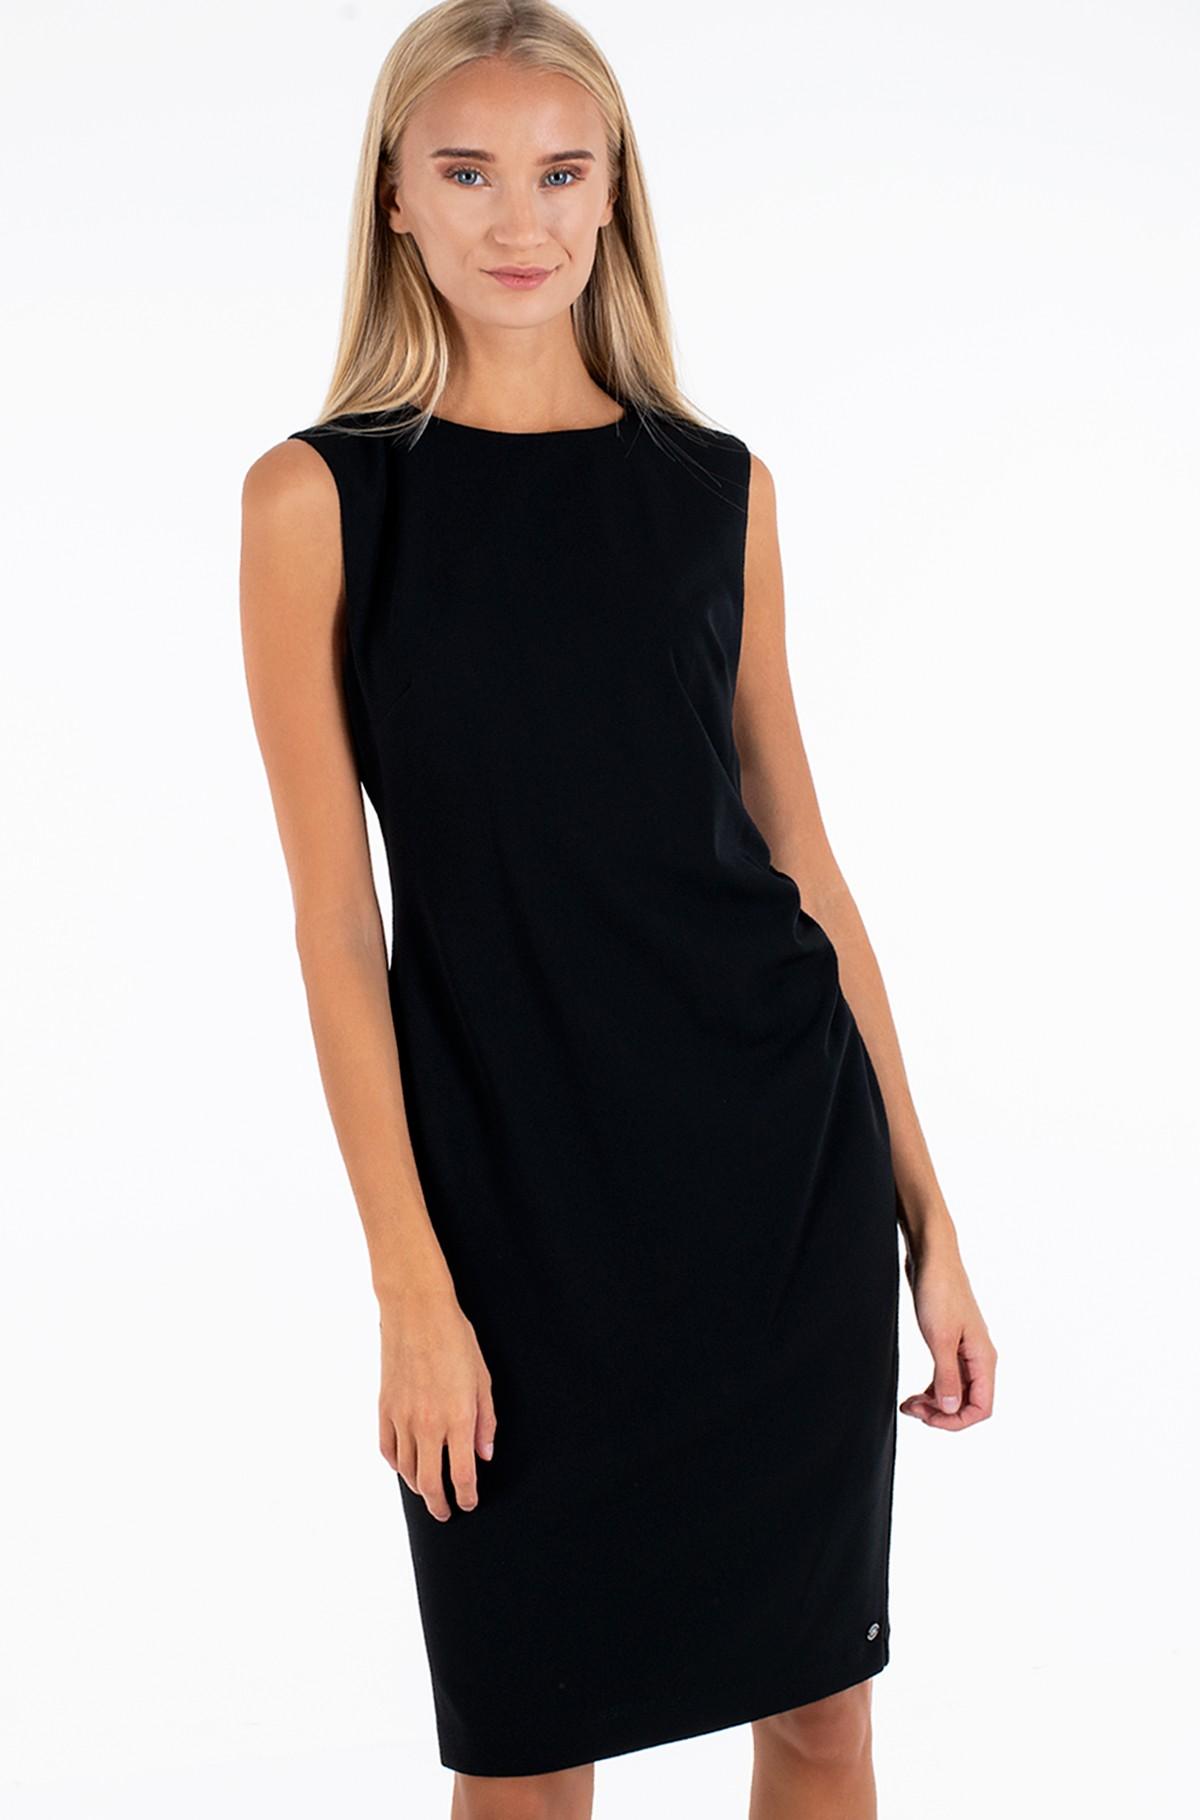 Kleita NS STRETCH SCUBA DRESS-full-1